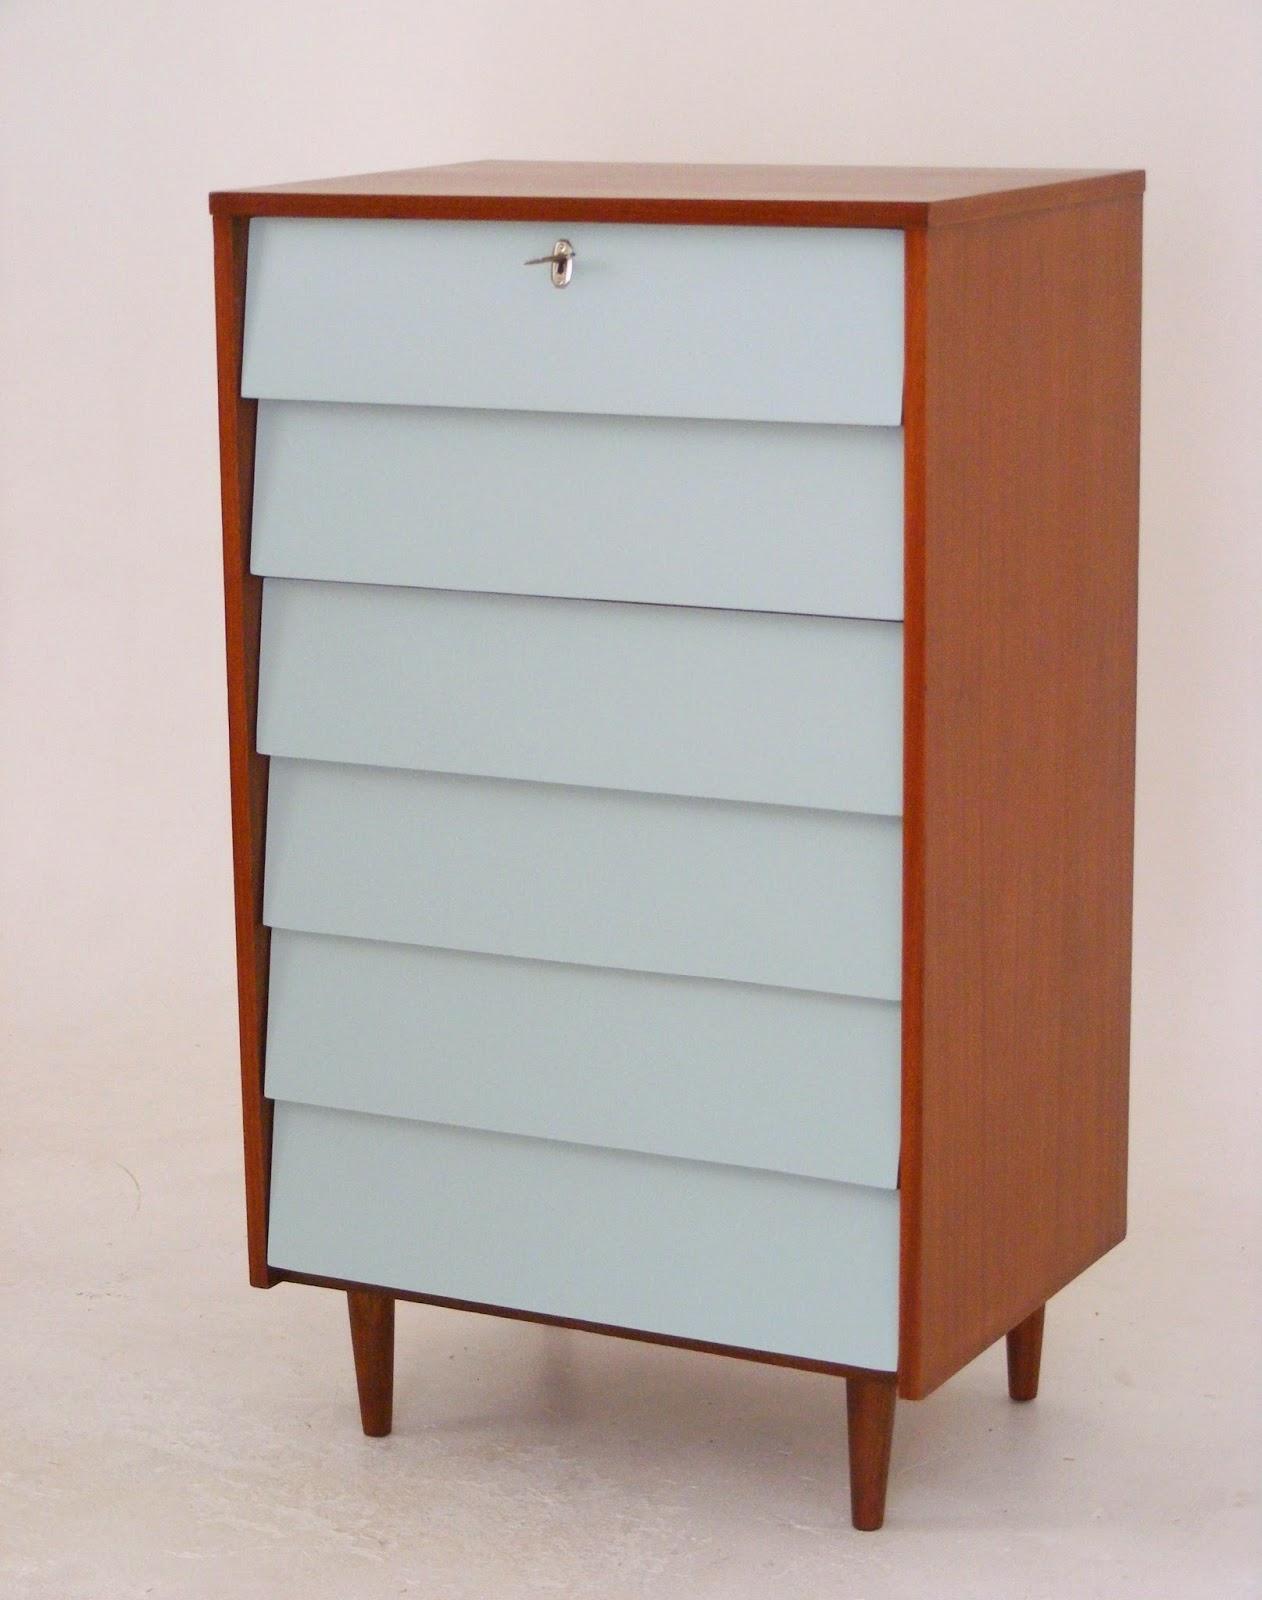 vintage m bel weiss ikea neuesten design kollektionen f r die familien. Black Bedroom Furniture Sets. Home Design Ideas